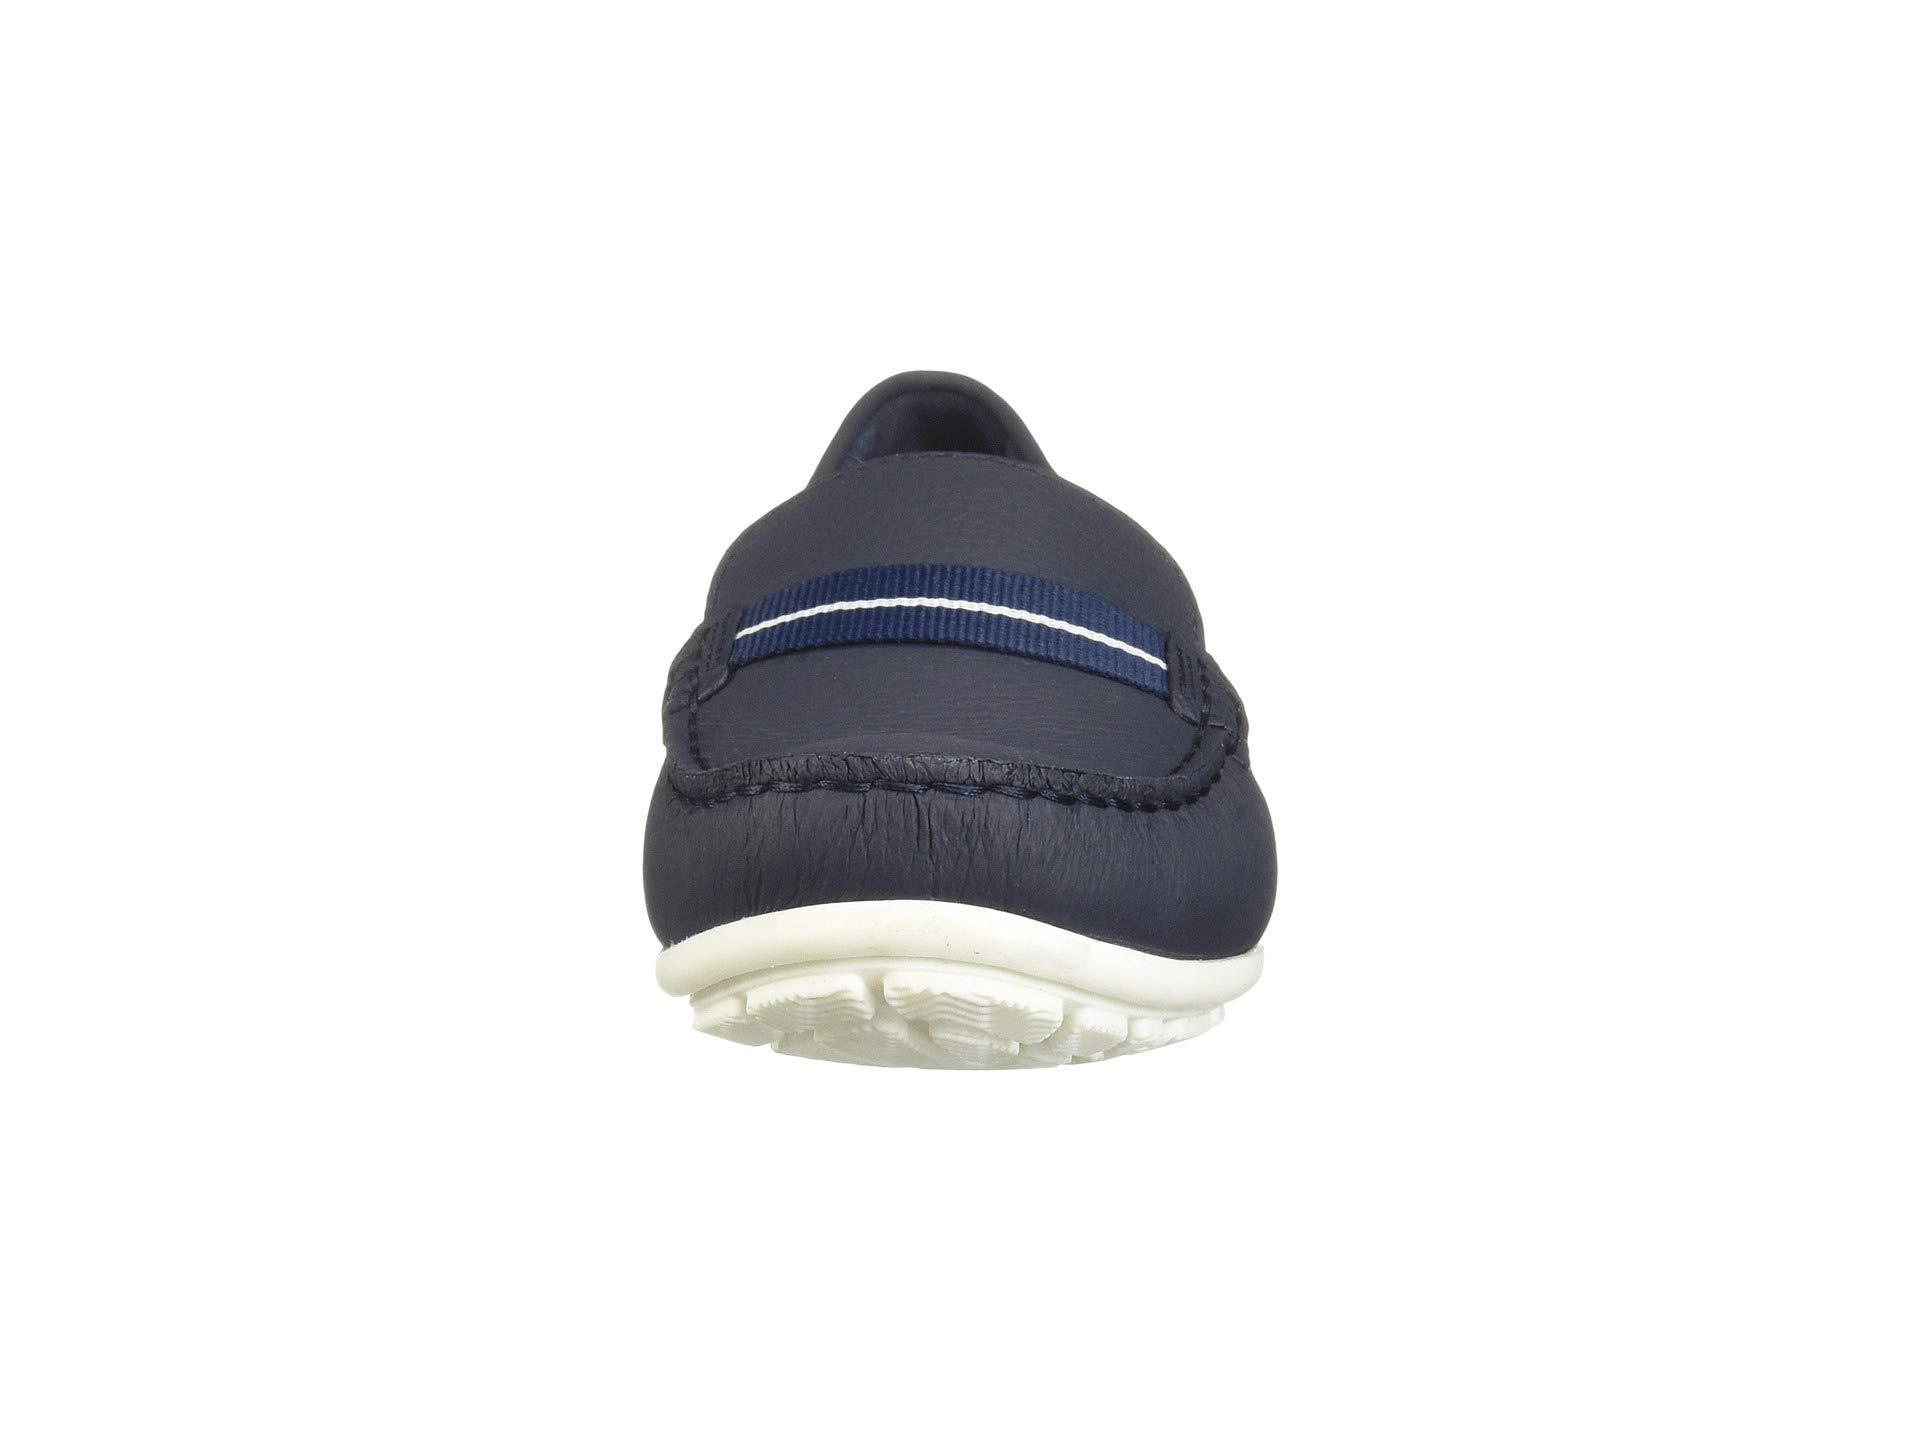 b8d7ee3b070 Clarks - Blue Dameo Vine - Lyst. View fullscreen